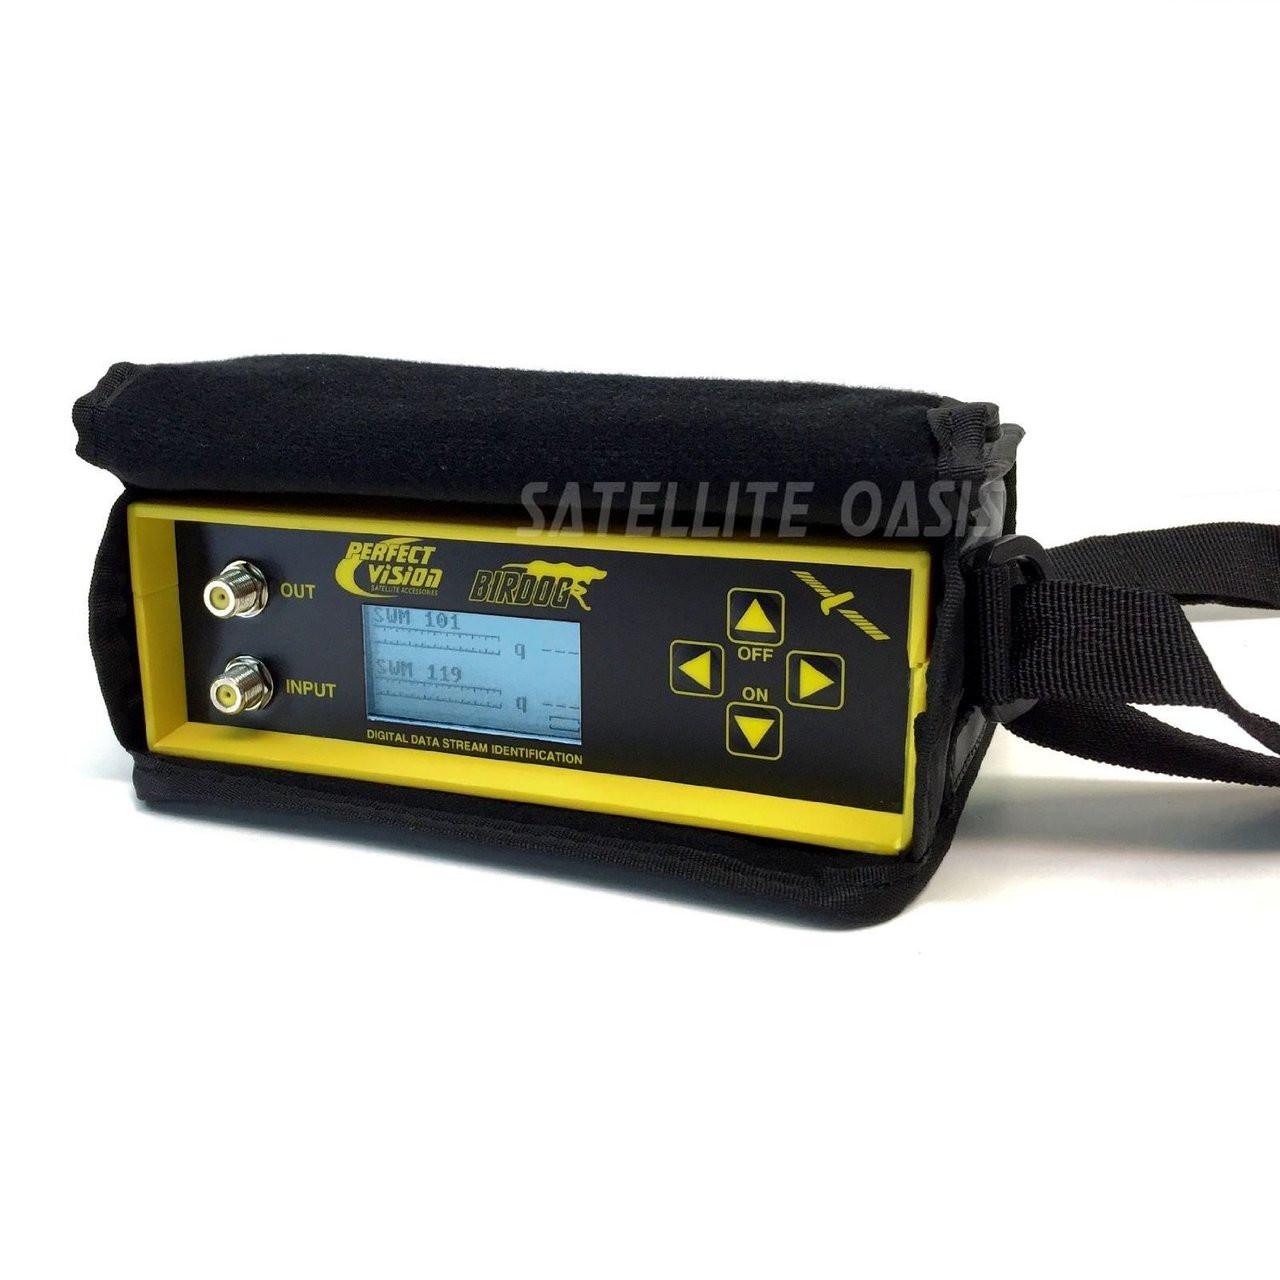 Refurbished Birdog / Bird dog Plus Satellite Signal Level